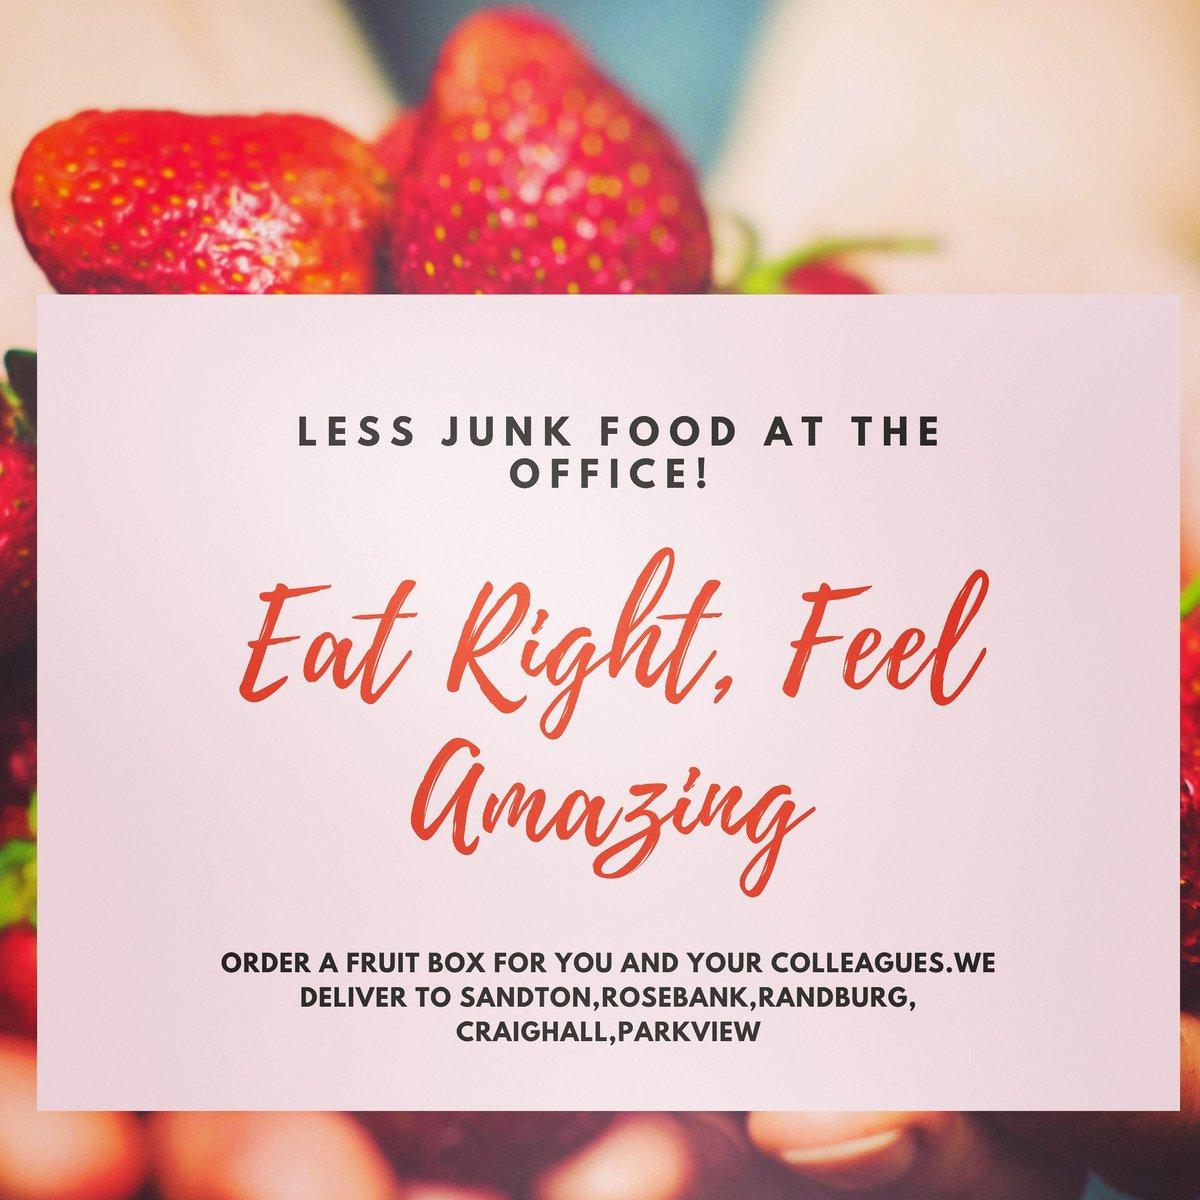 Kwezigidi Trading Coporate wellness campaign 2020. #fruitboxes  #officefruits #DJSBU email at: kwezigidi@gmail.com Company orders only https://t.co/qSIwf1lGHu